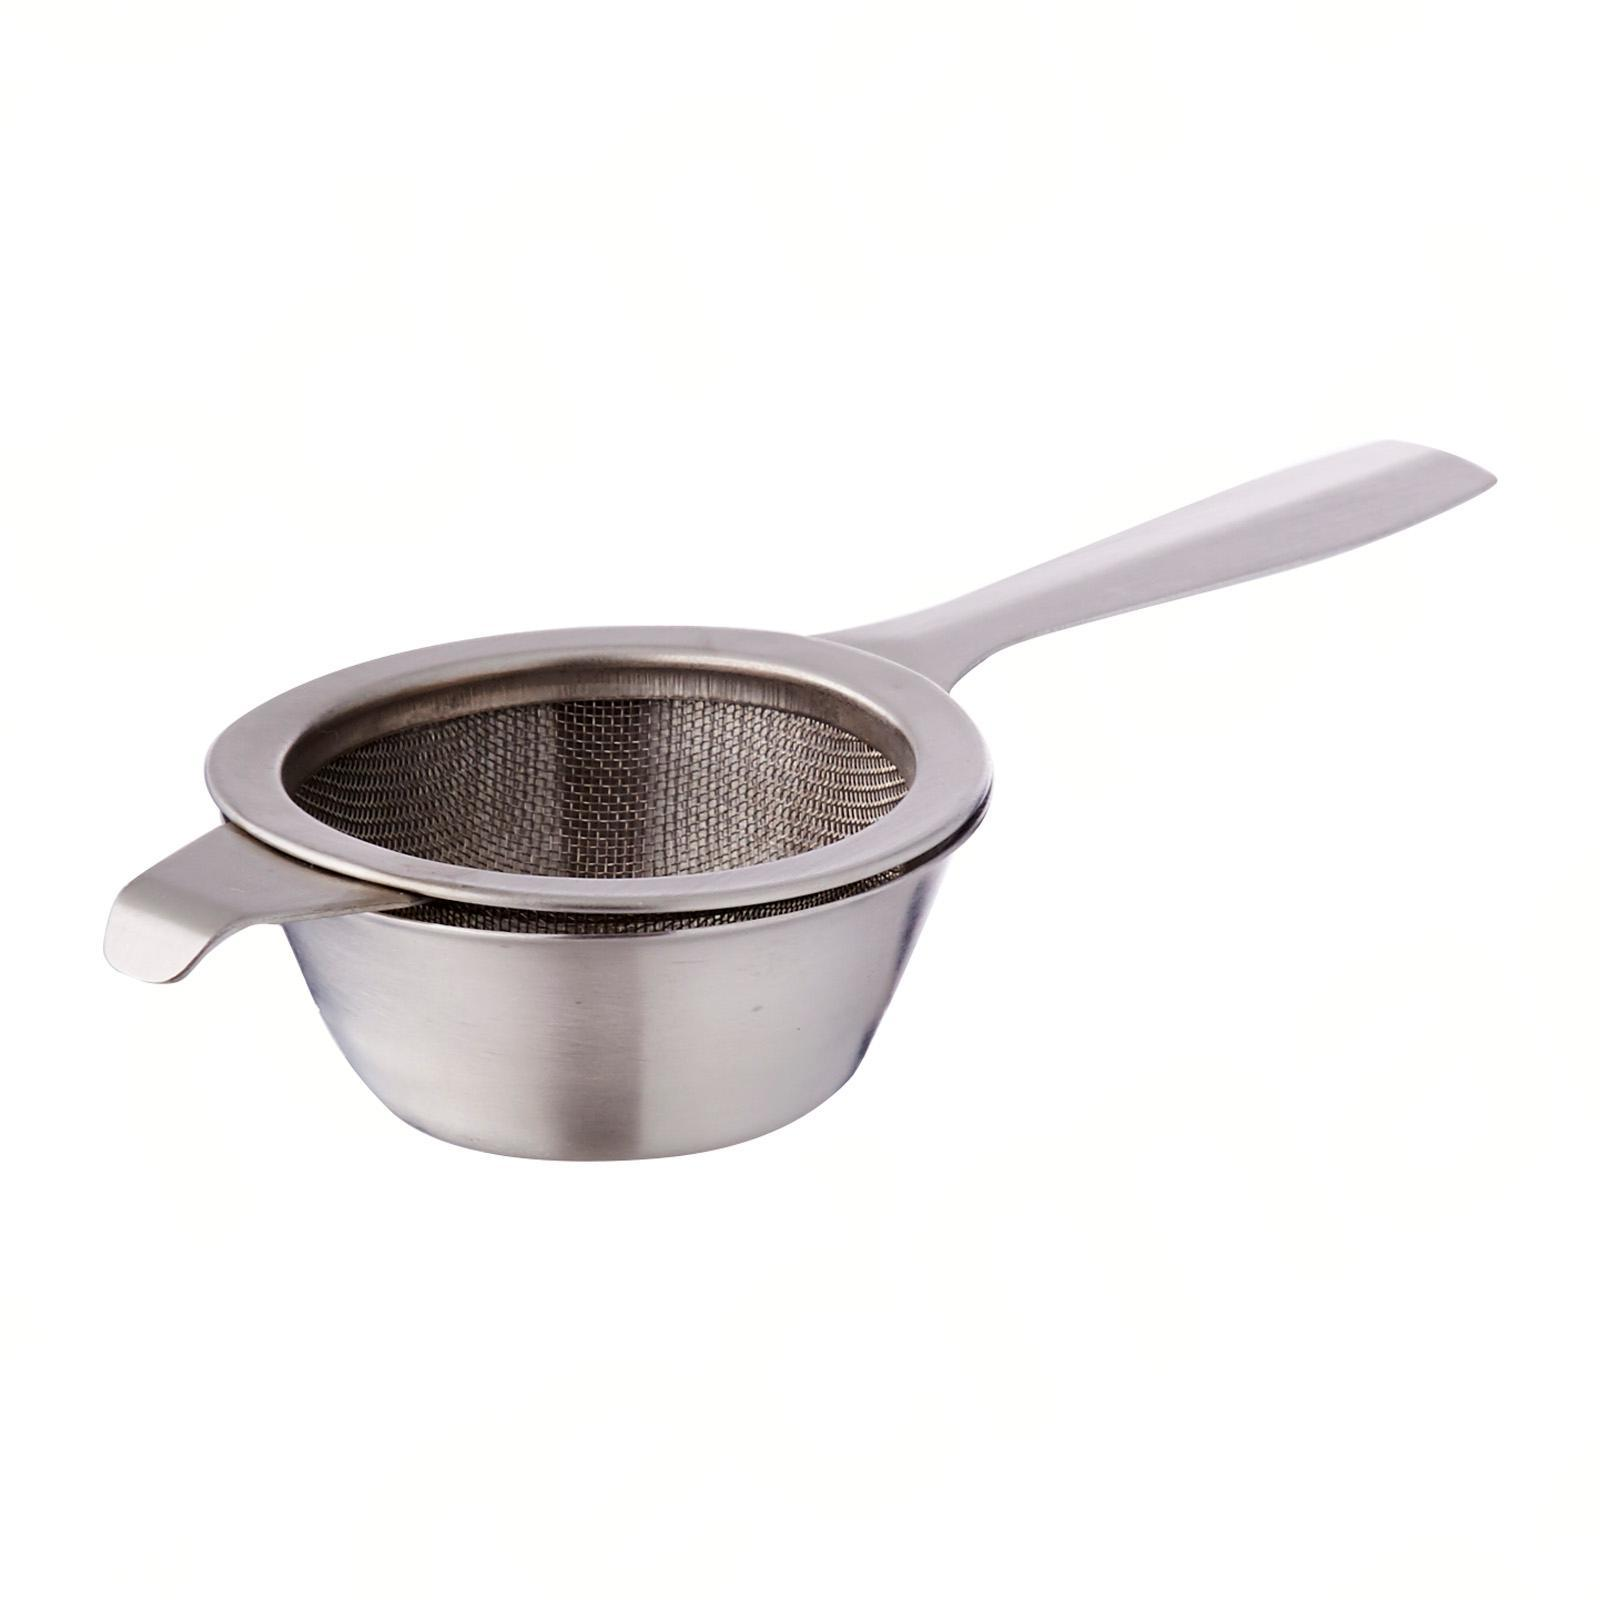 Sunnex Stainless Steel Tea Strainer With Drip Bowl